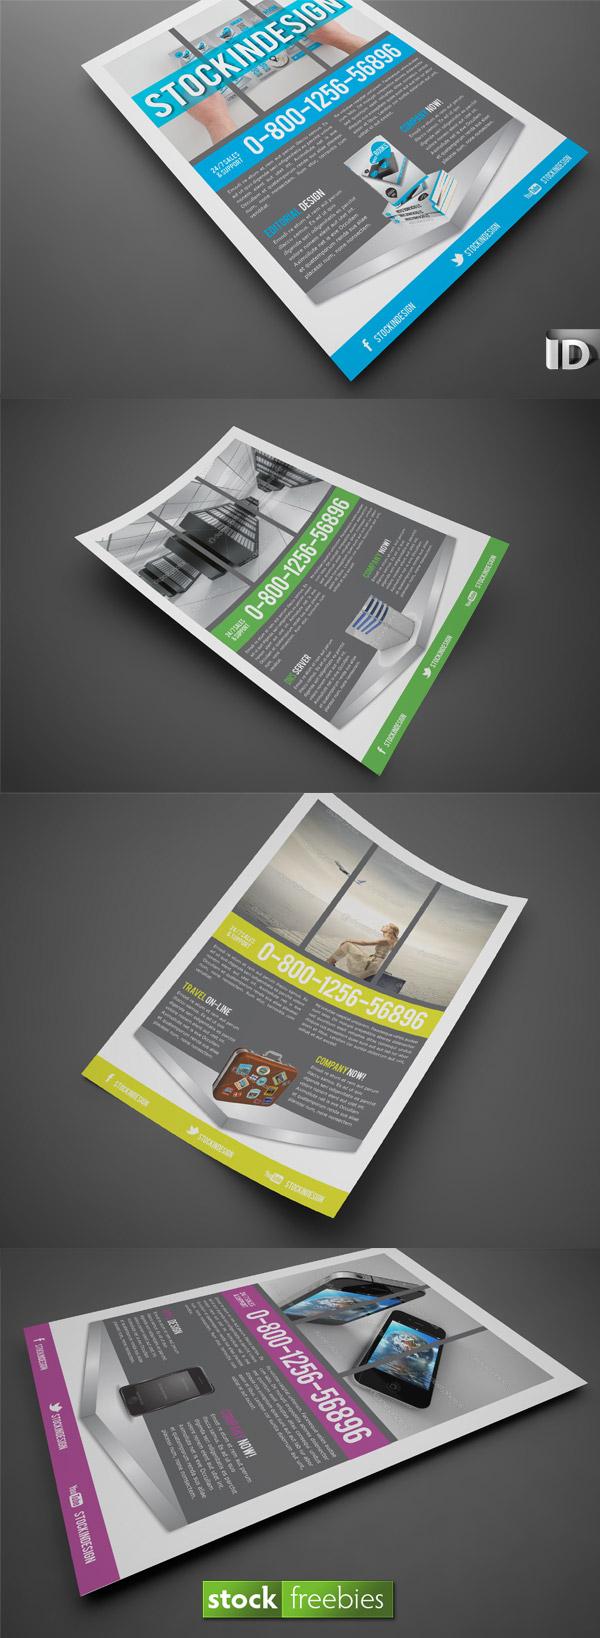 Product Showcase Flyer - Free